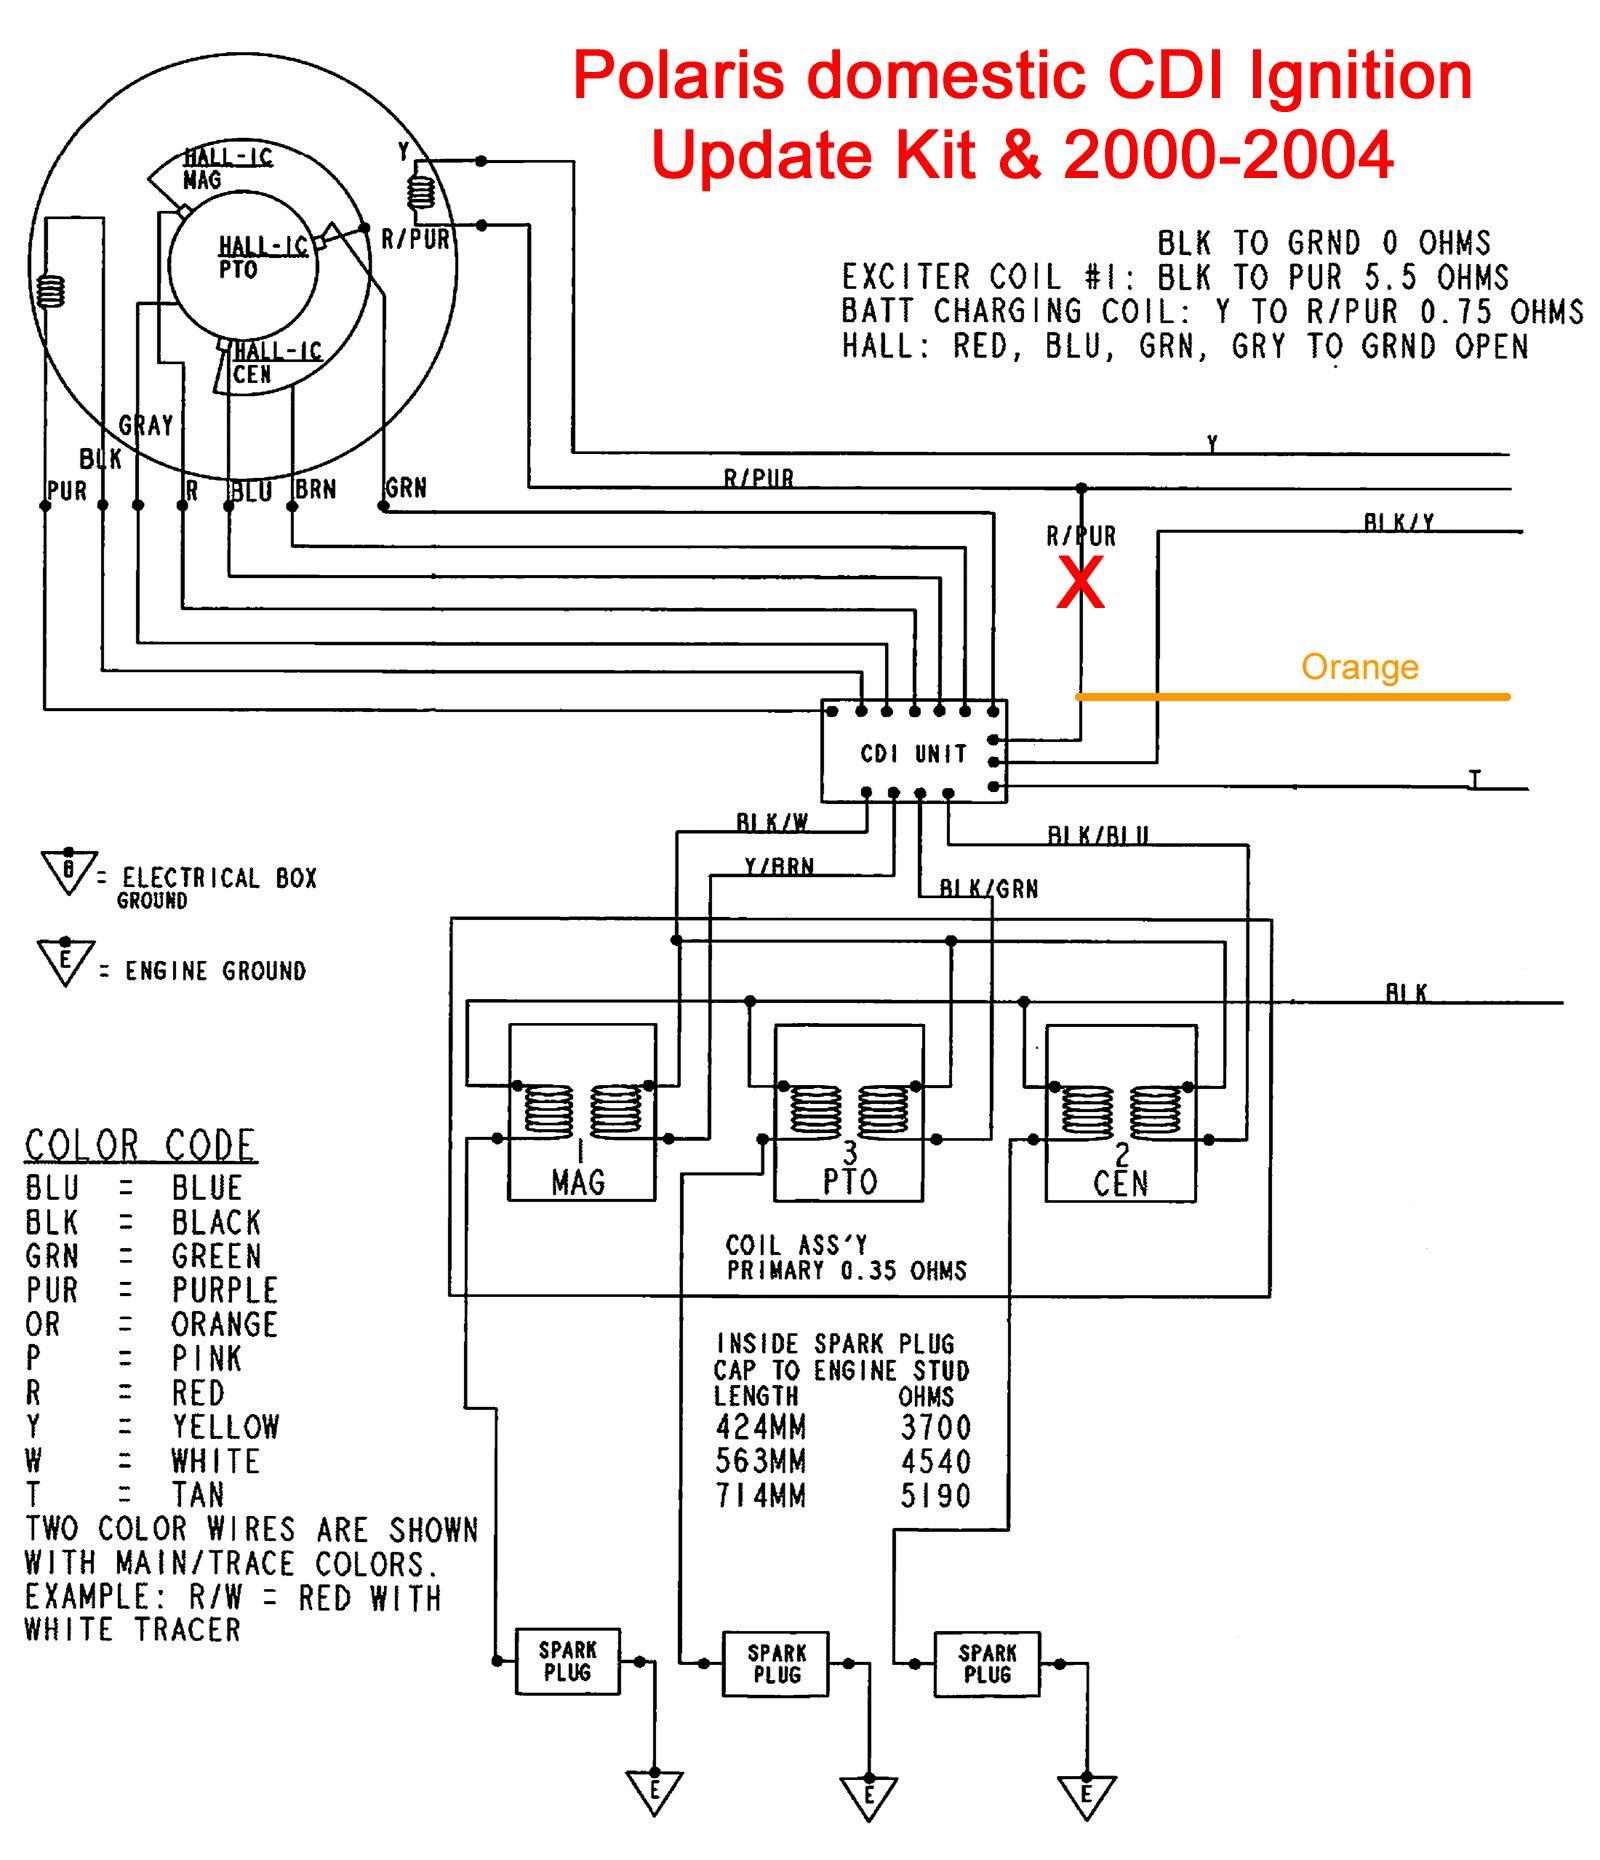 Polaris Hawkeye Wiring Diagram Stereo Wiring Diagram For 1992 Honda Accord 7ways Losdol2 Jeanjaures37 Fr